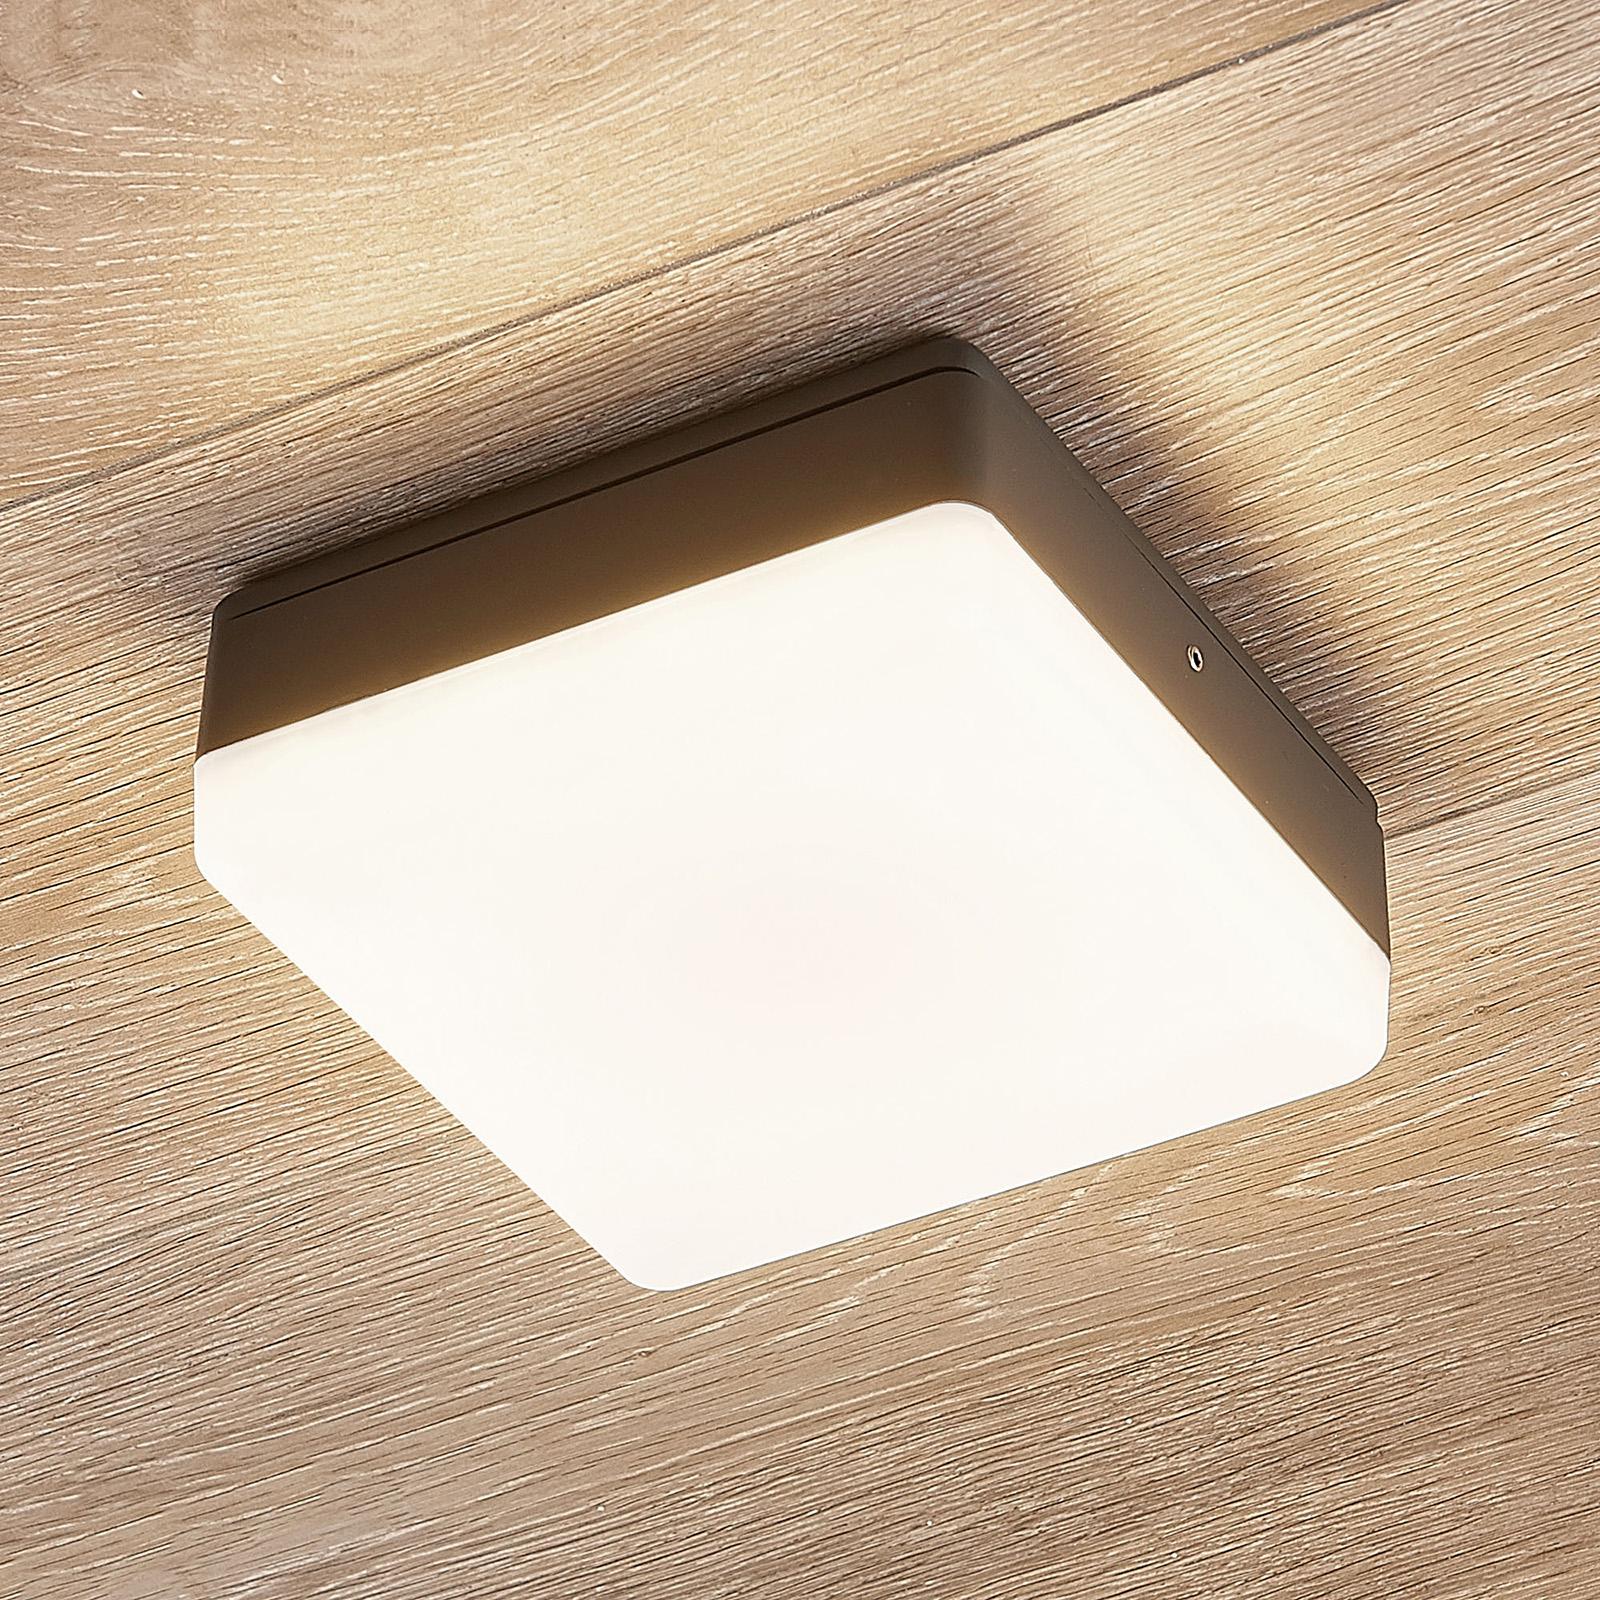 Lampa sufitowa LED Thlio, szary, 16 cm, czujnik HF